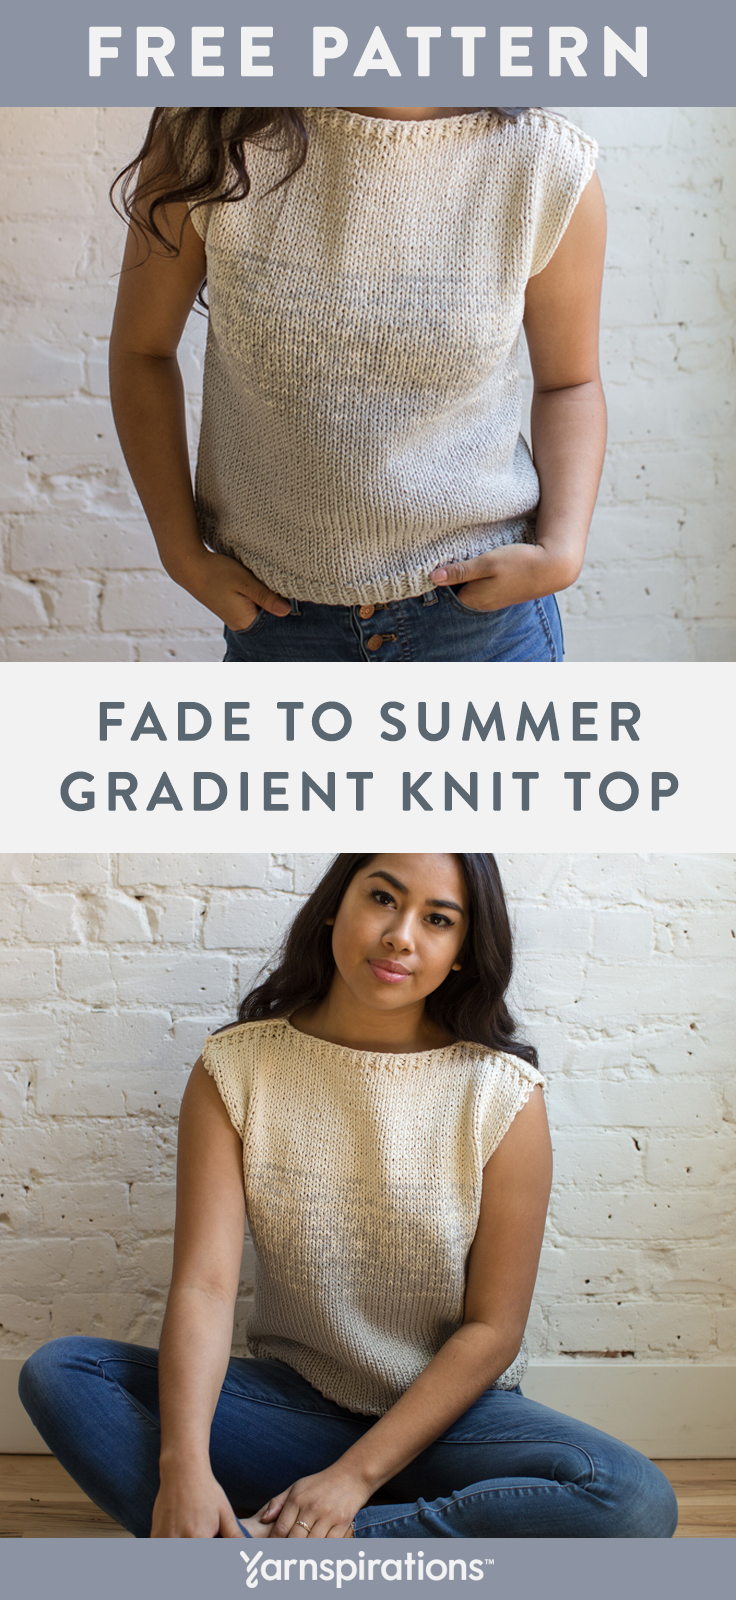 Fade To Summer Gradient TShirt  Free Knitting Pattern  Yarnspirations  Flax  Fade To Summer Gradient TShirt  Free Knitting Pattern  Yarnspirations  Flax  Fade To Summer G...